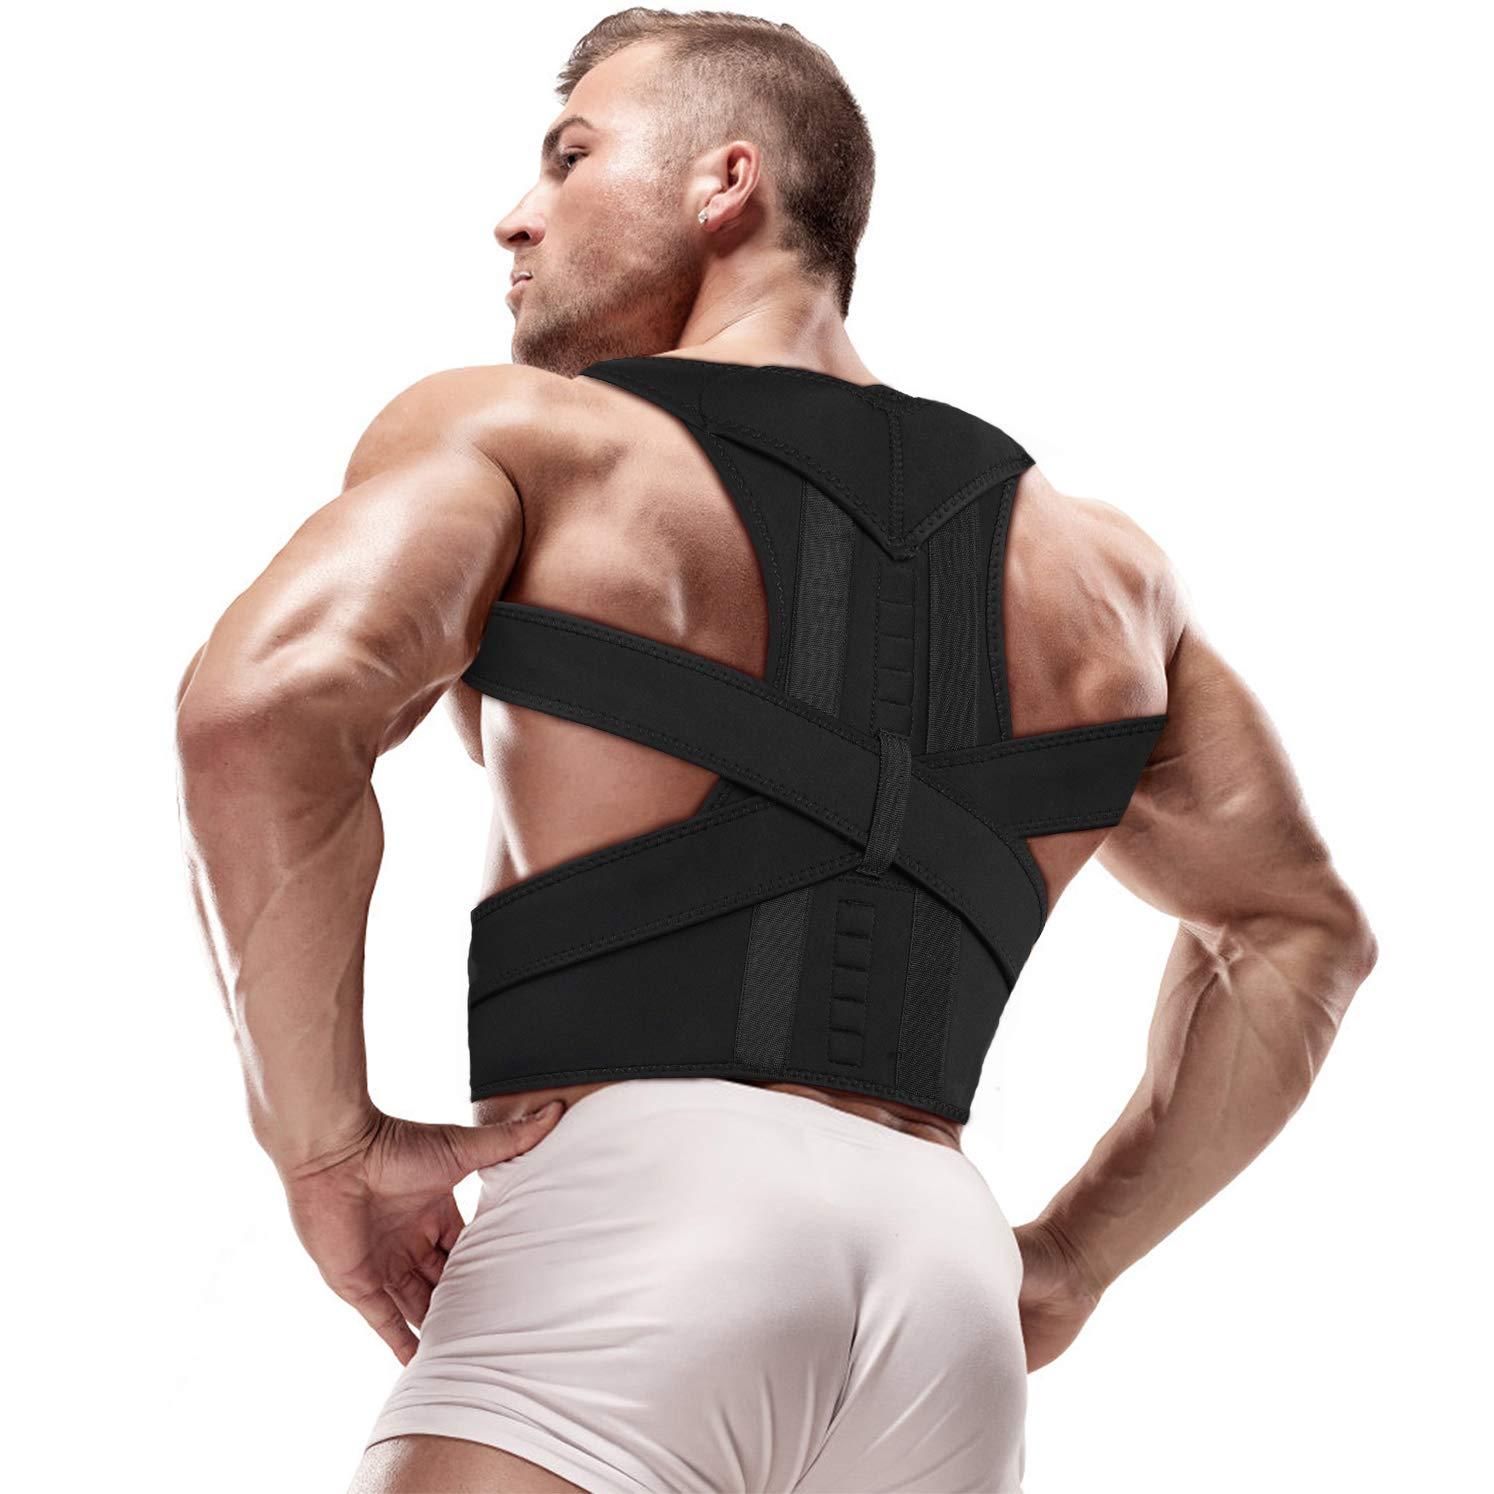 Posture Corrector, Magnetic Back Brace - Posture Corrector for Men - Back Straightener Posture Corrector - Back Support - Size L (33'' - 37'') Waist by Aptoco